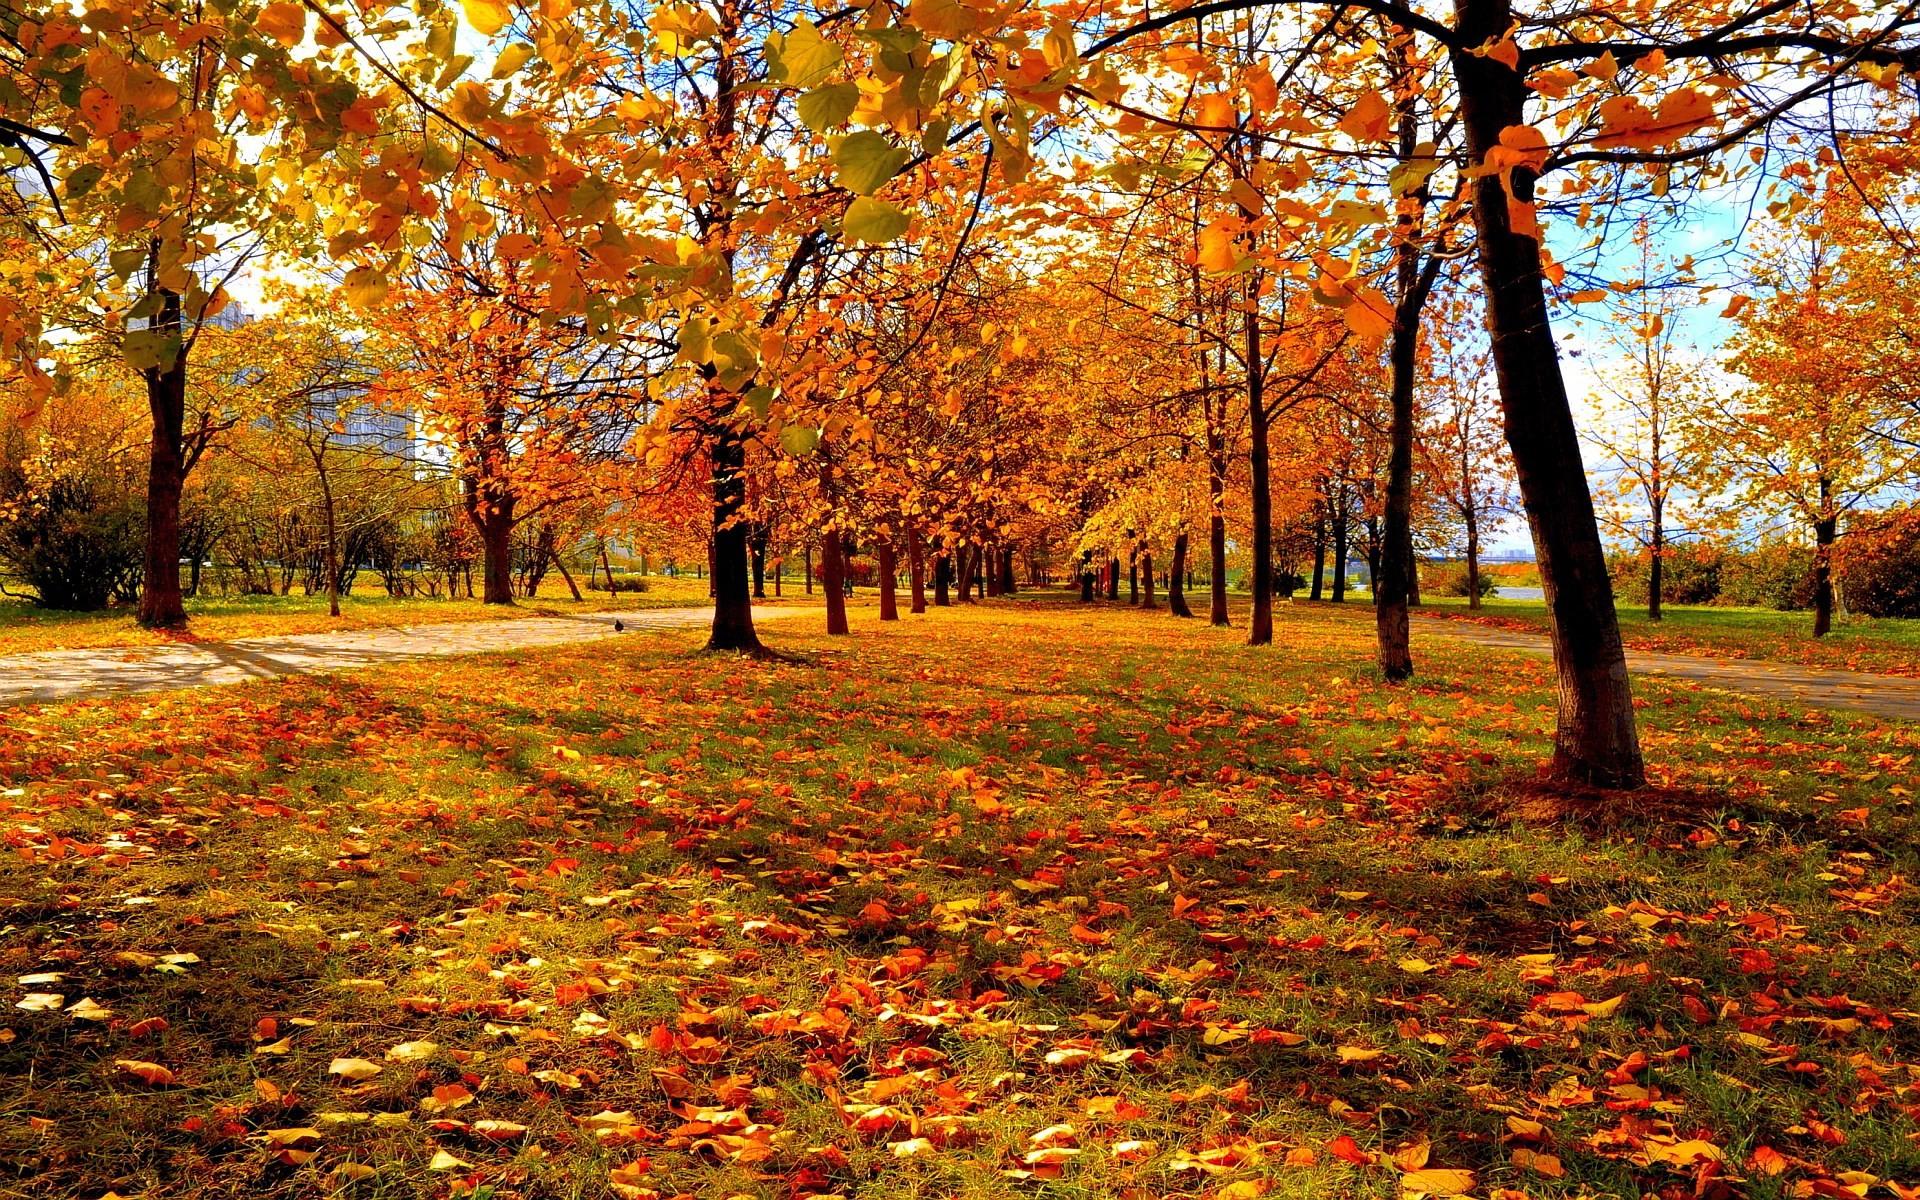 fall wallpaper pack 1080p hd